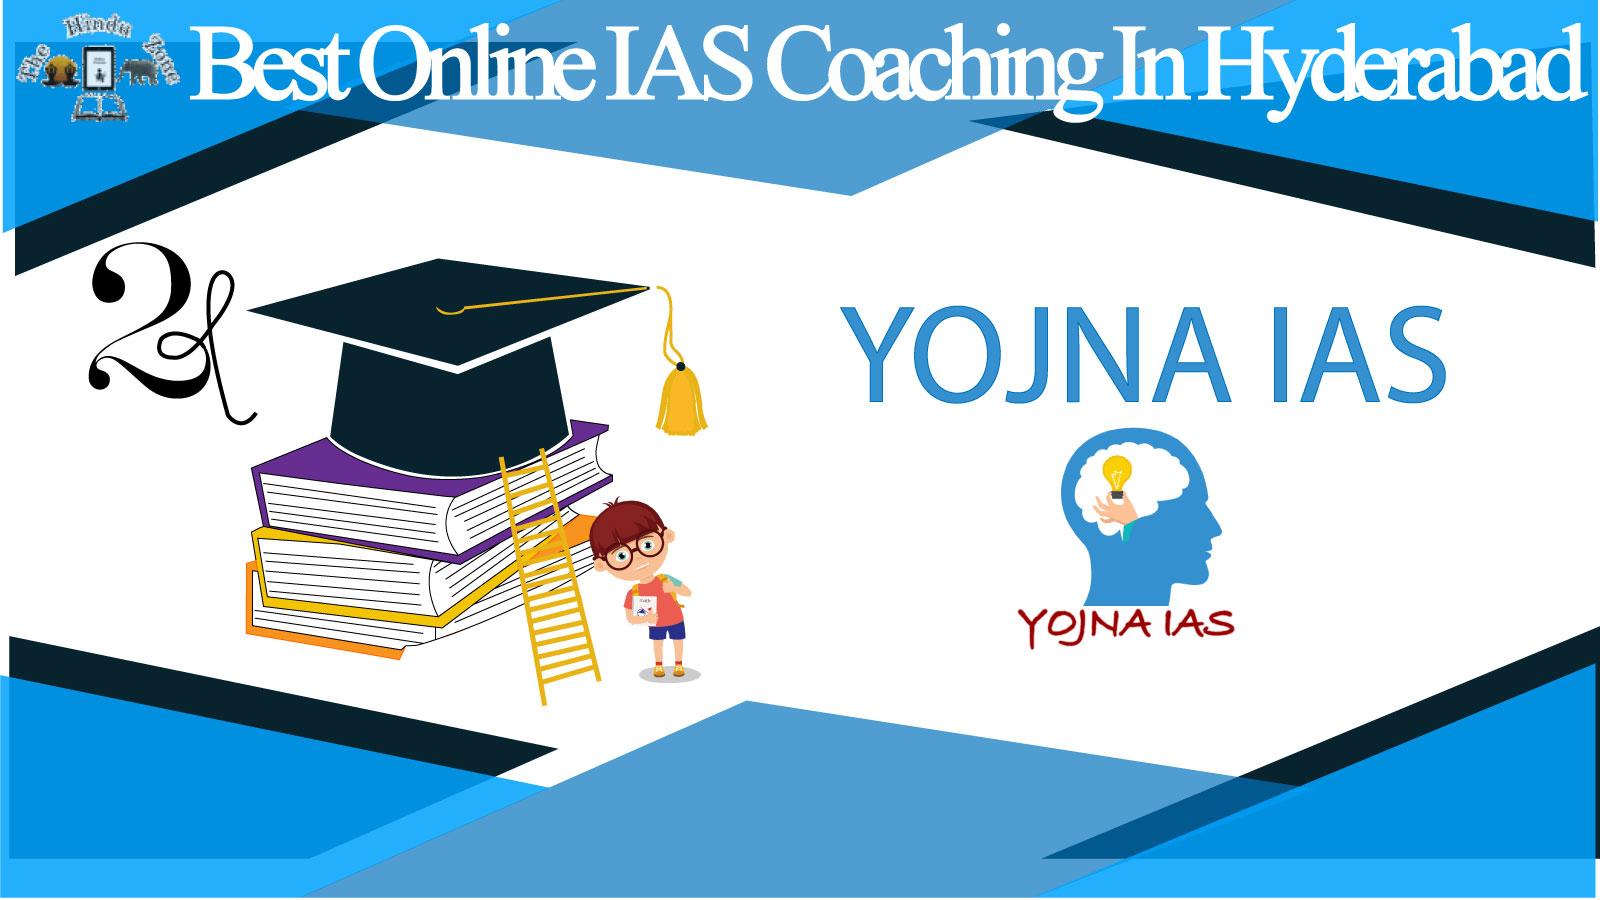 Yojna IAS online Coaching in Hyderabad